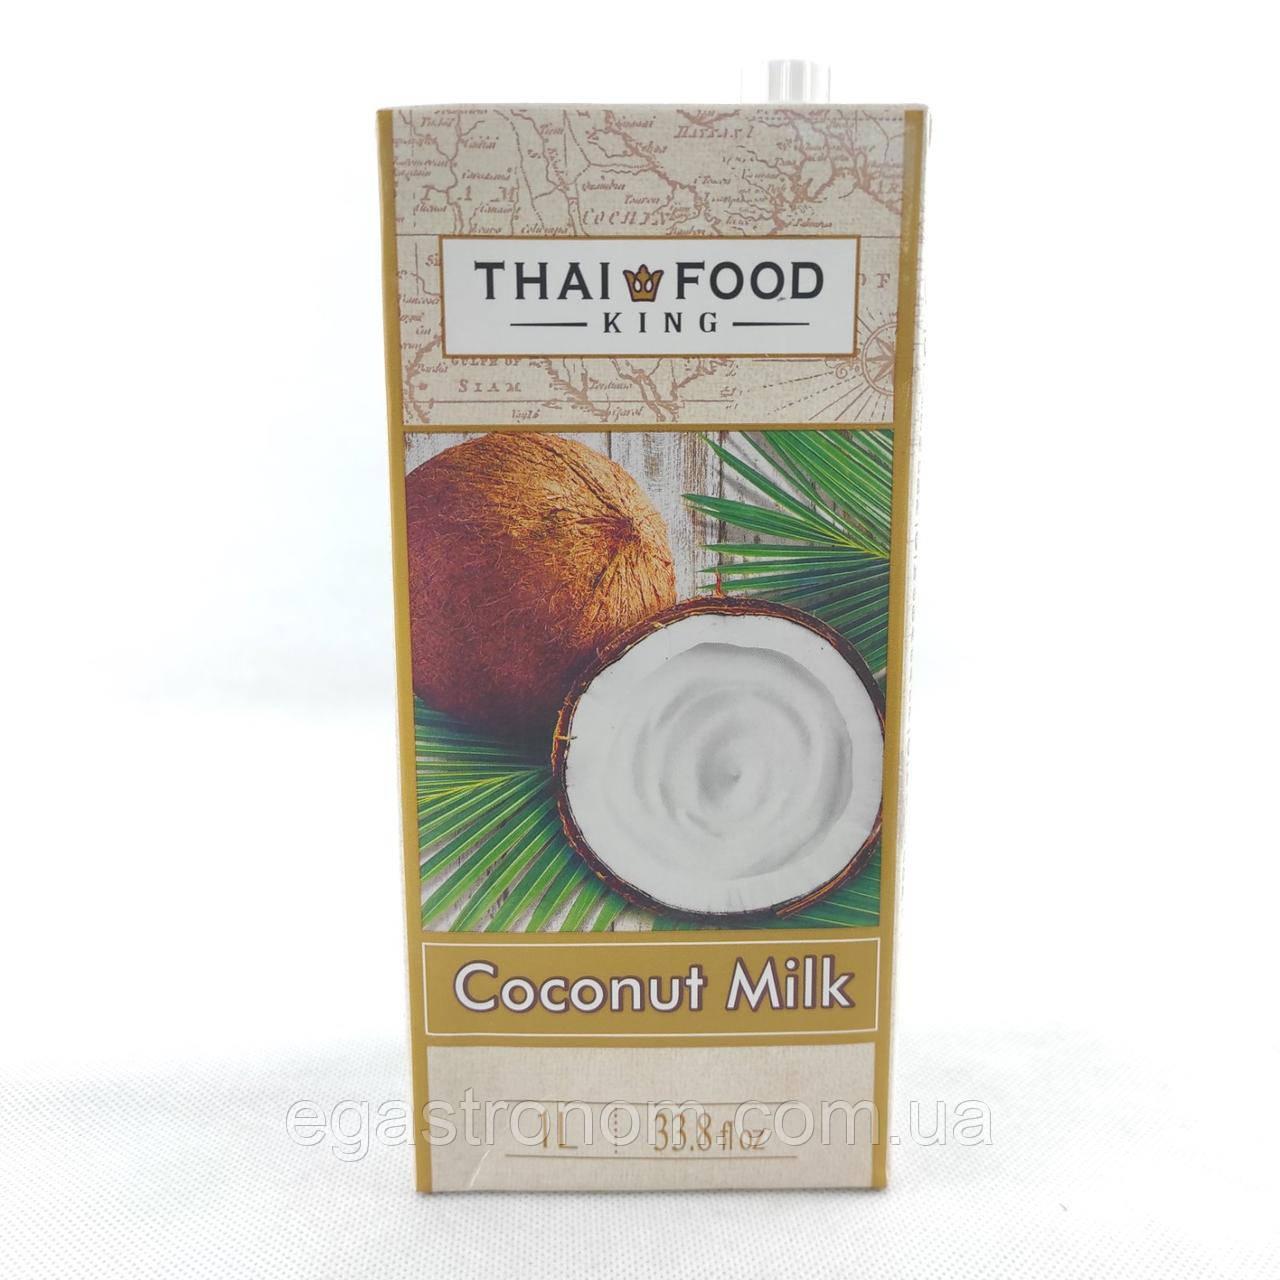 Кокосове молоко Thai Food 1L 12шт/ящ (Код : 00-00003047)